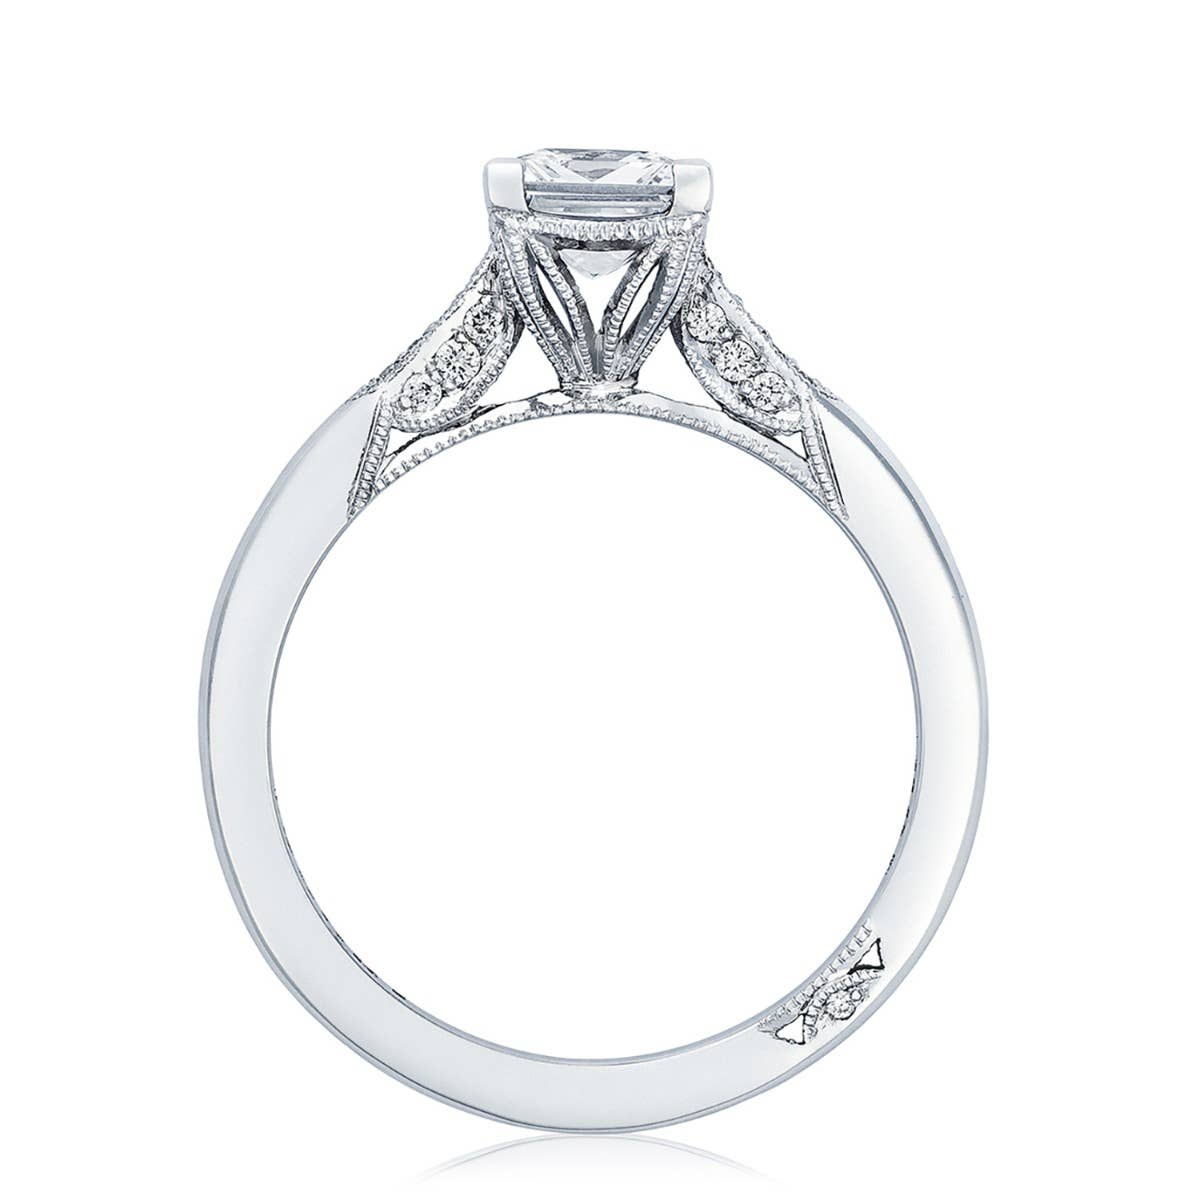 Tacori Engagement Rings - 2651pr